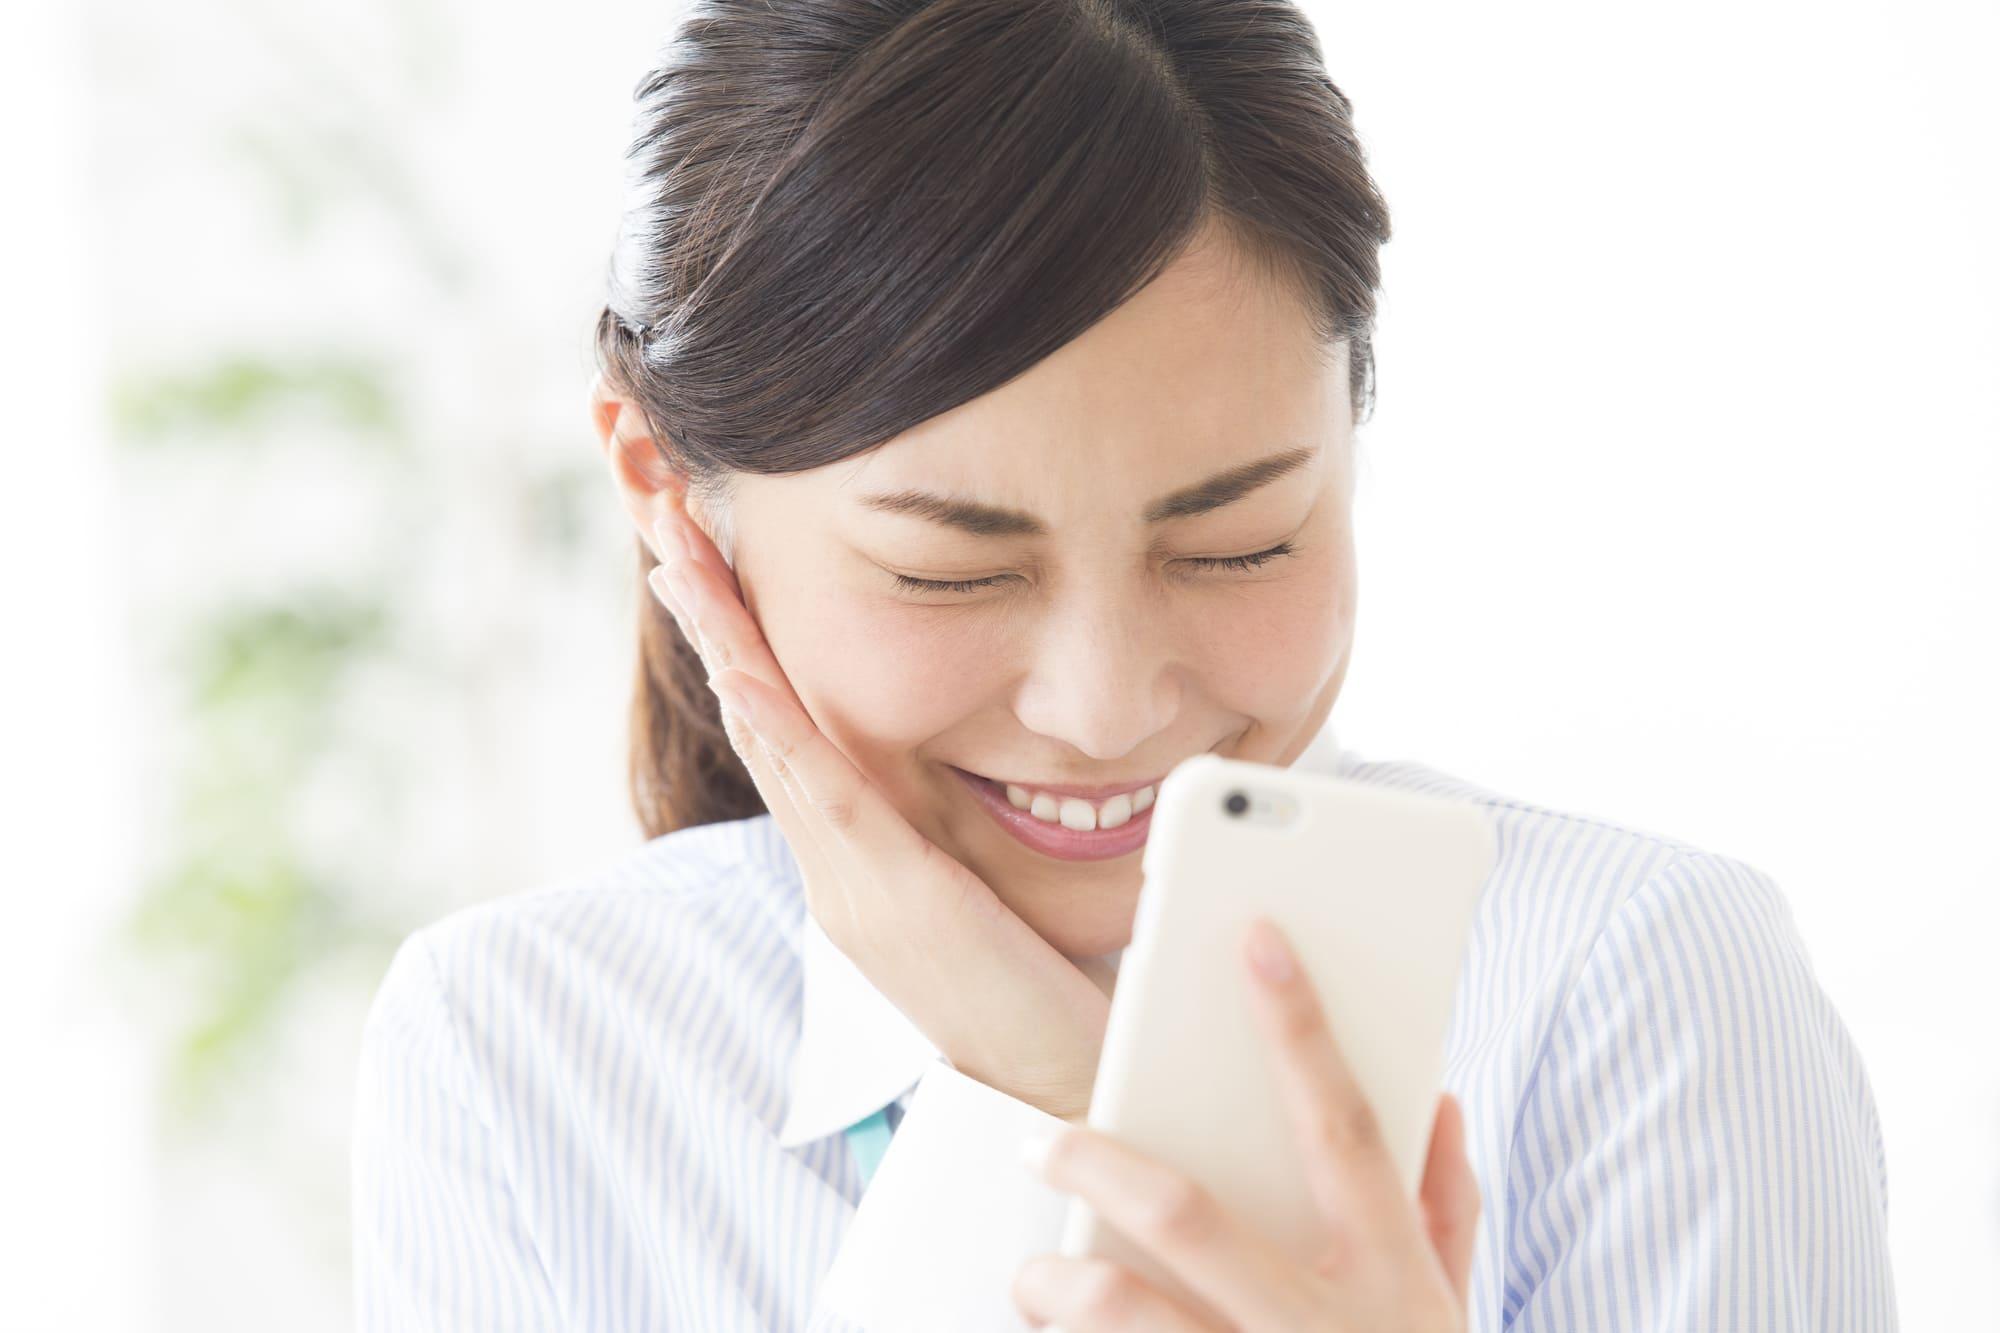 NTTドコモが高還元率の「dポイント スーパー還元プログラム」の提供を開始!